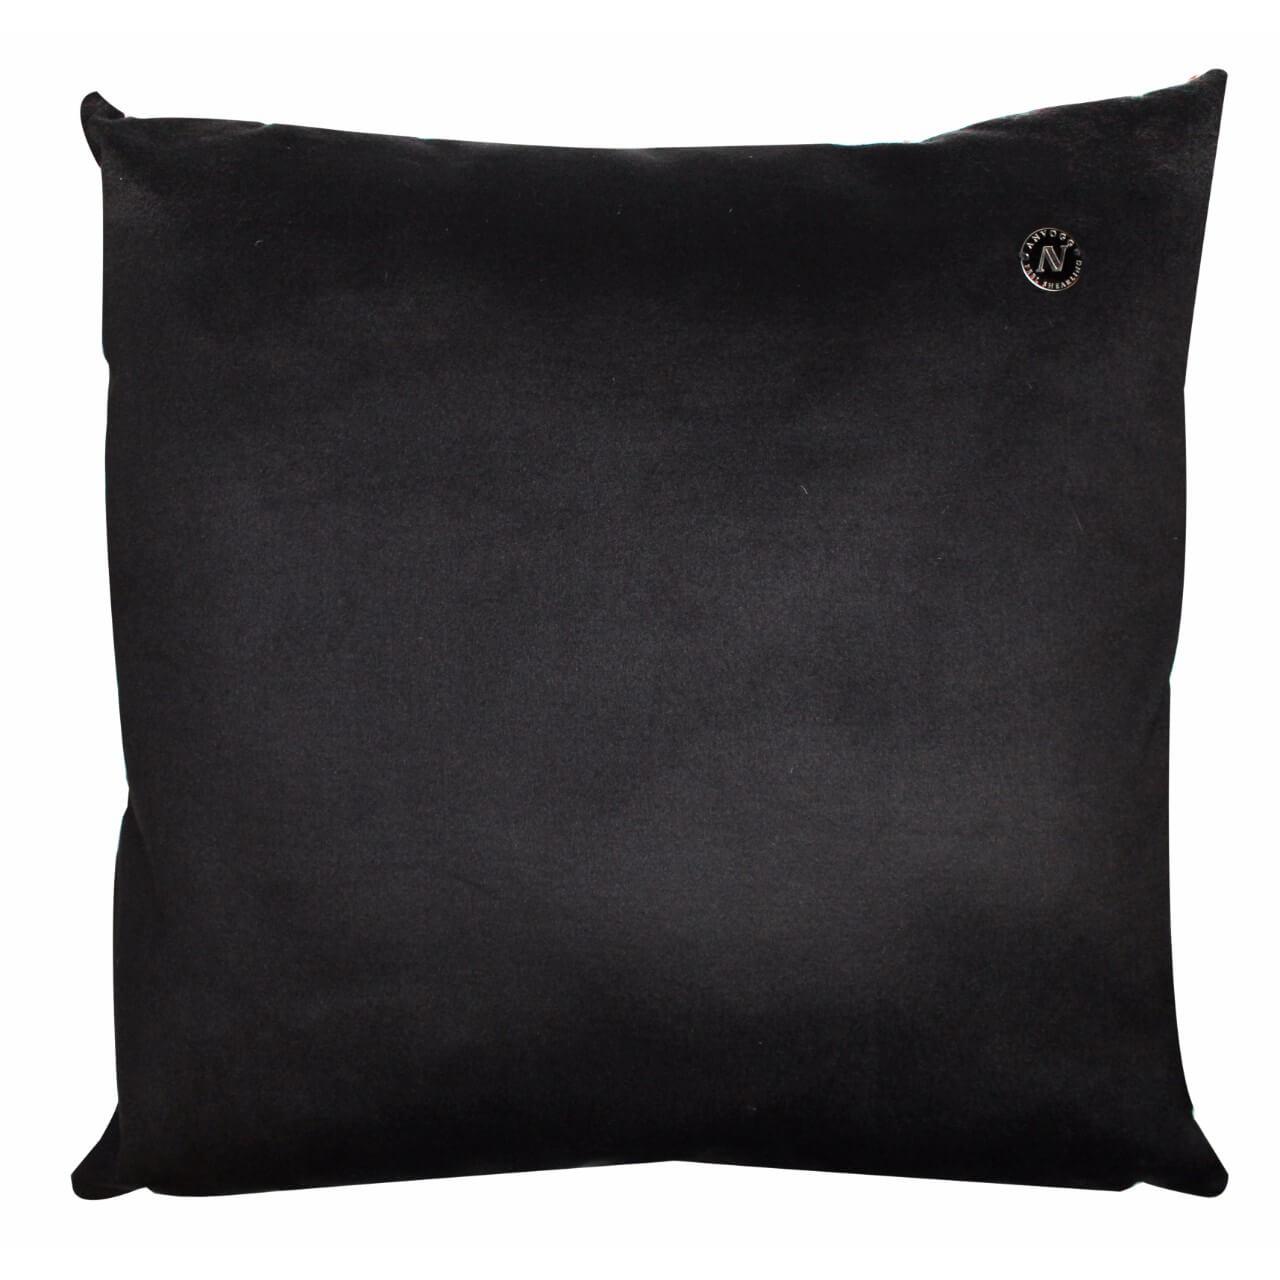 Cavallino Pillow-50x50cm-(RENK_Omega)-(İSİM_Omega The Squa)-(CPOME1224BBL5050) arka - ANVOGG FEEL SHEARLING | ANVOGG